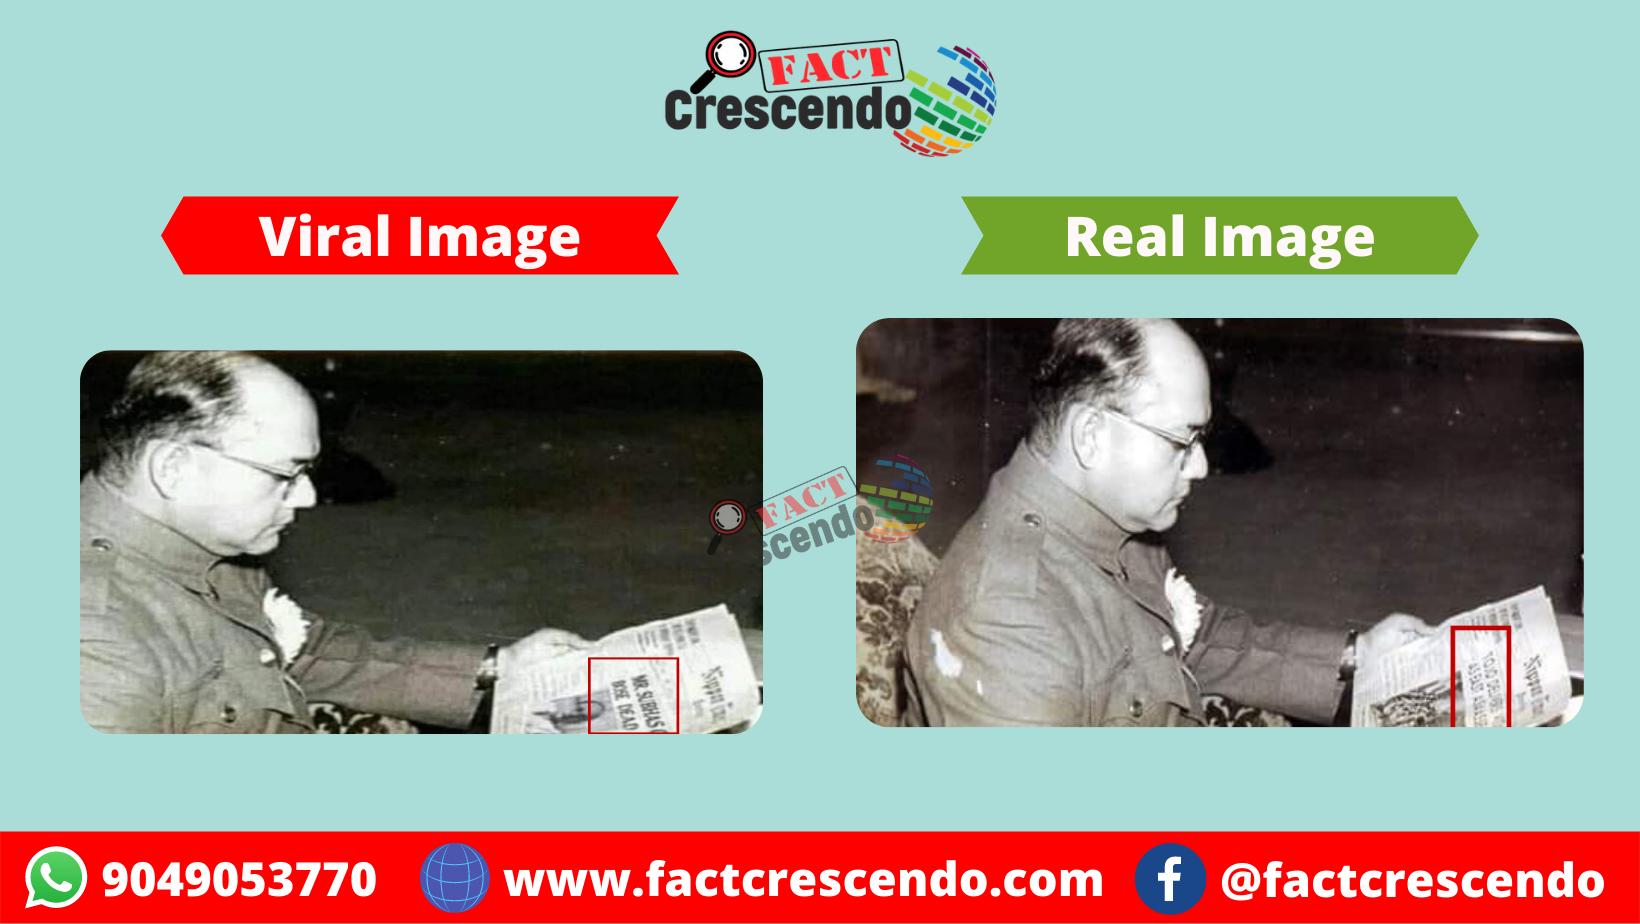 Copy of Horizontal Image Comparison.png